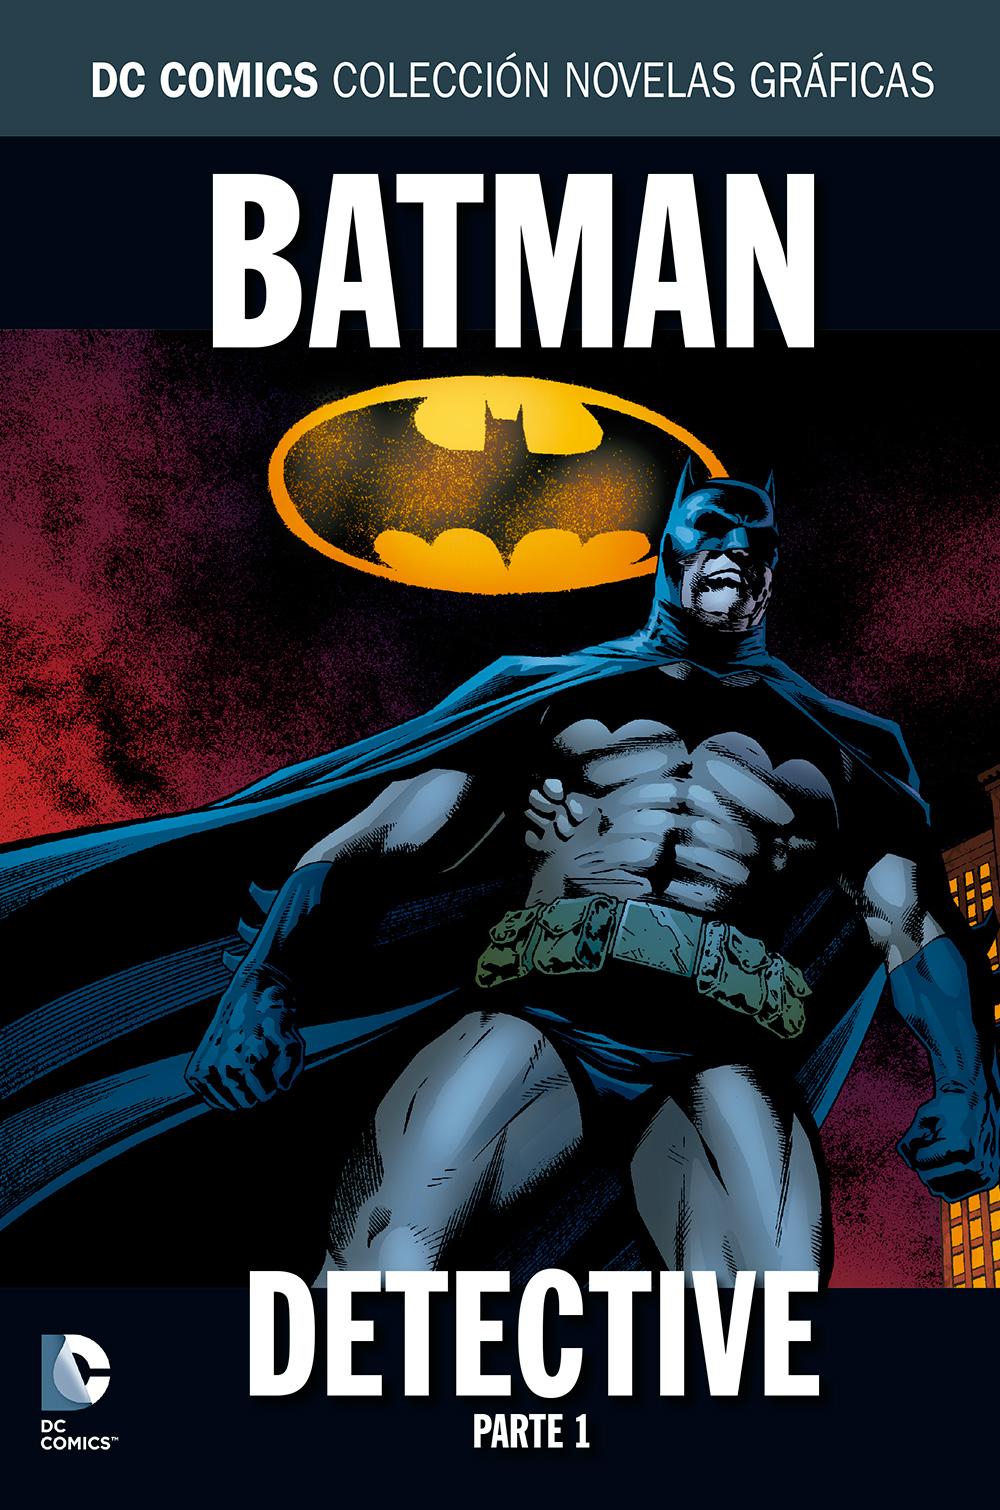 41-44 - [DC - Salvat] La Colección de Novelas Gráficas de DC Comics  SF118_035_01_001